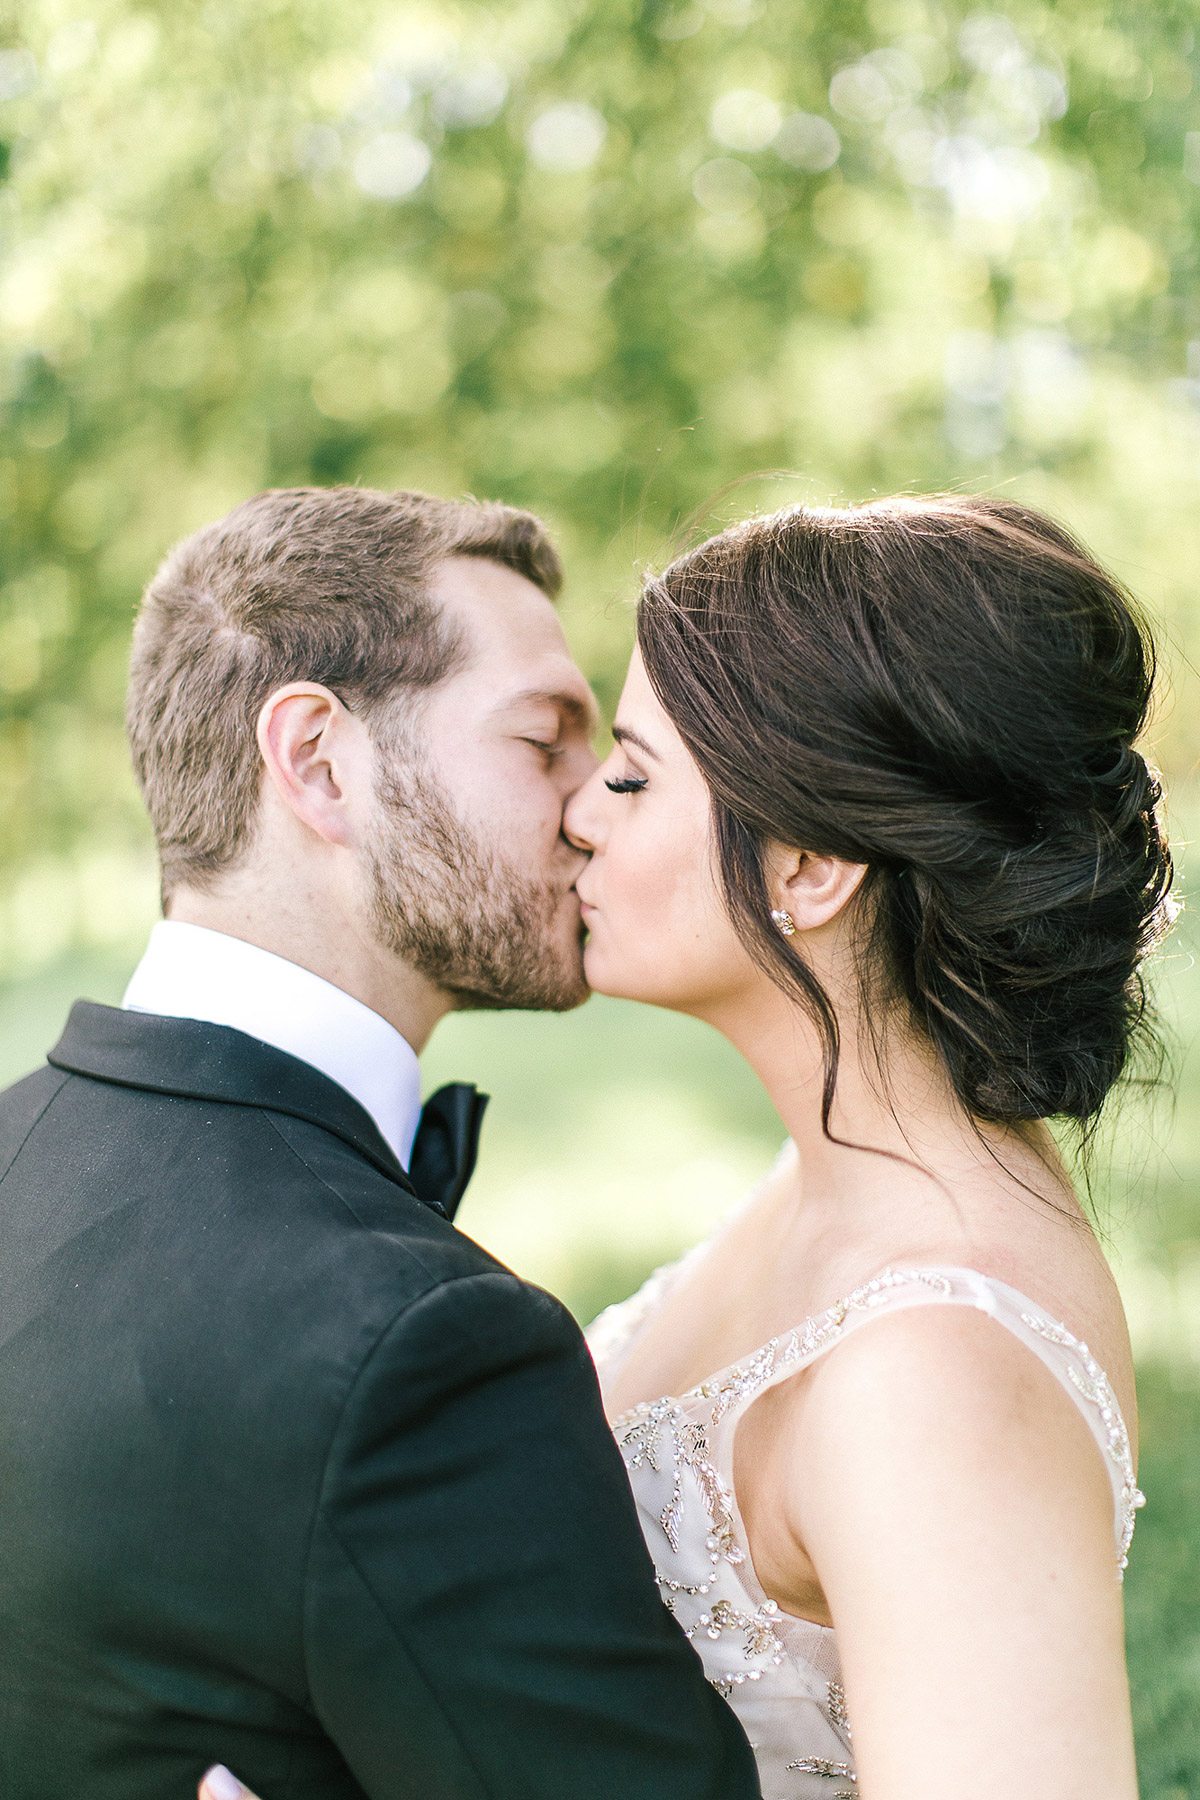 tamara-lockwood-photography-vineyard-bride-swish-list-the-old-courthouse-niagara-on-the-lake-wedding-33.jpg